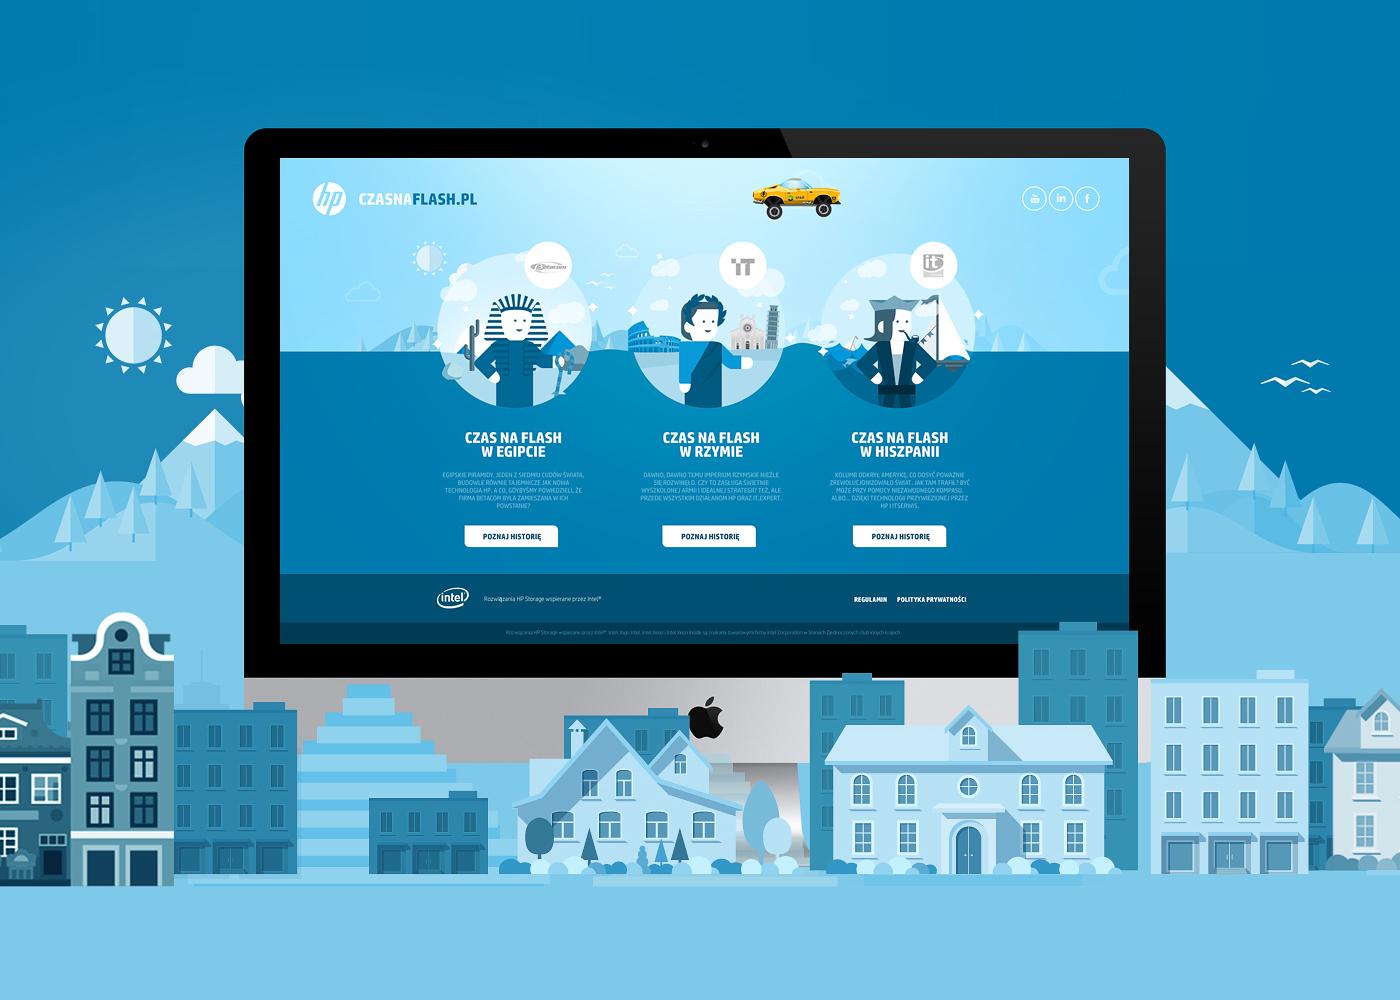 Hewlett Packard Site